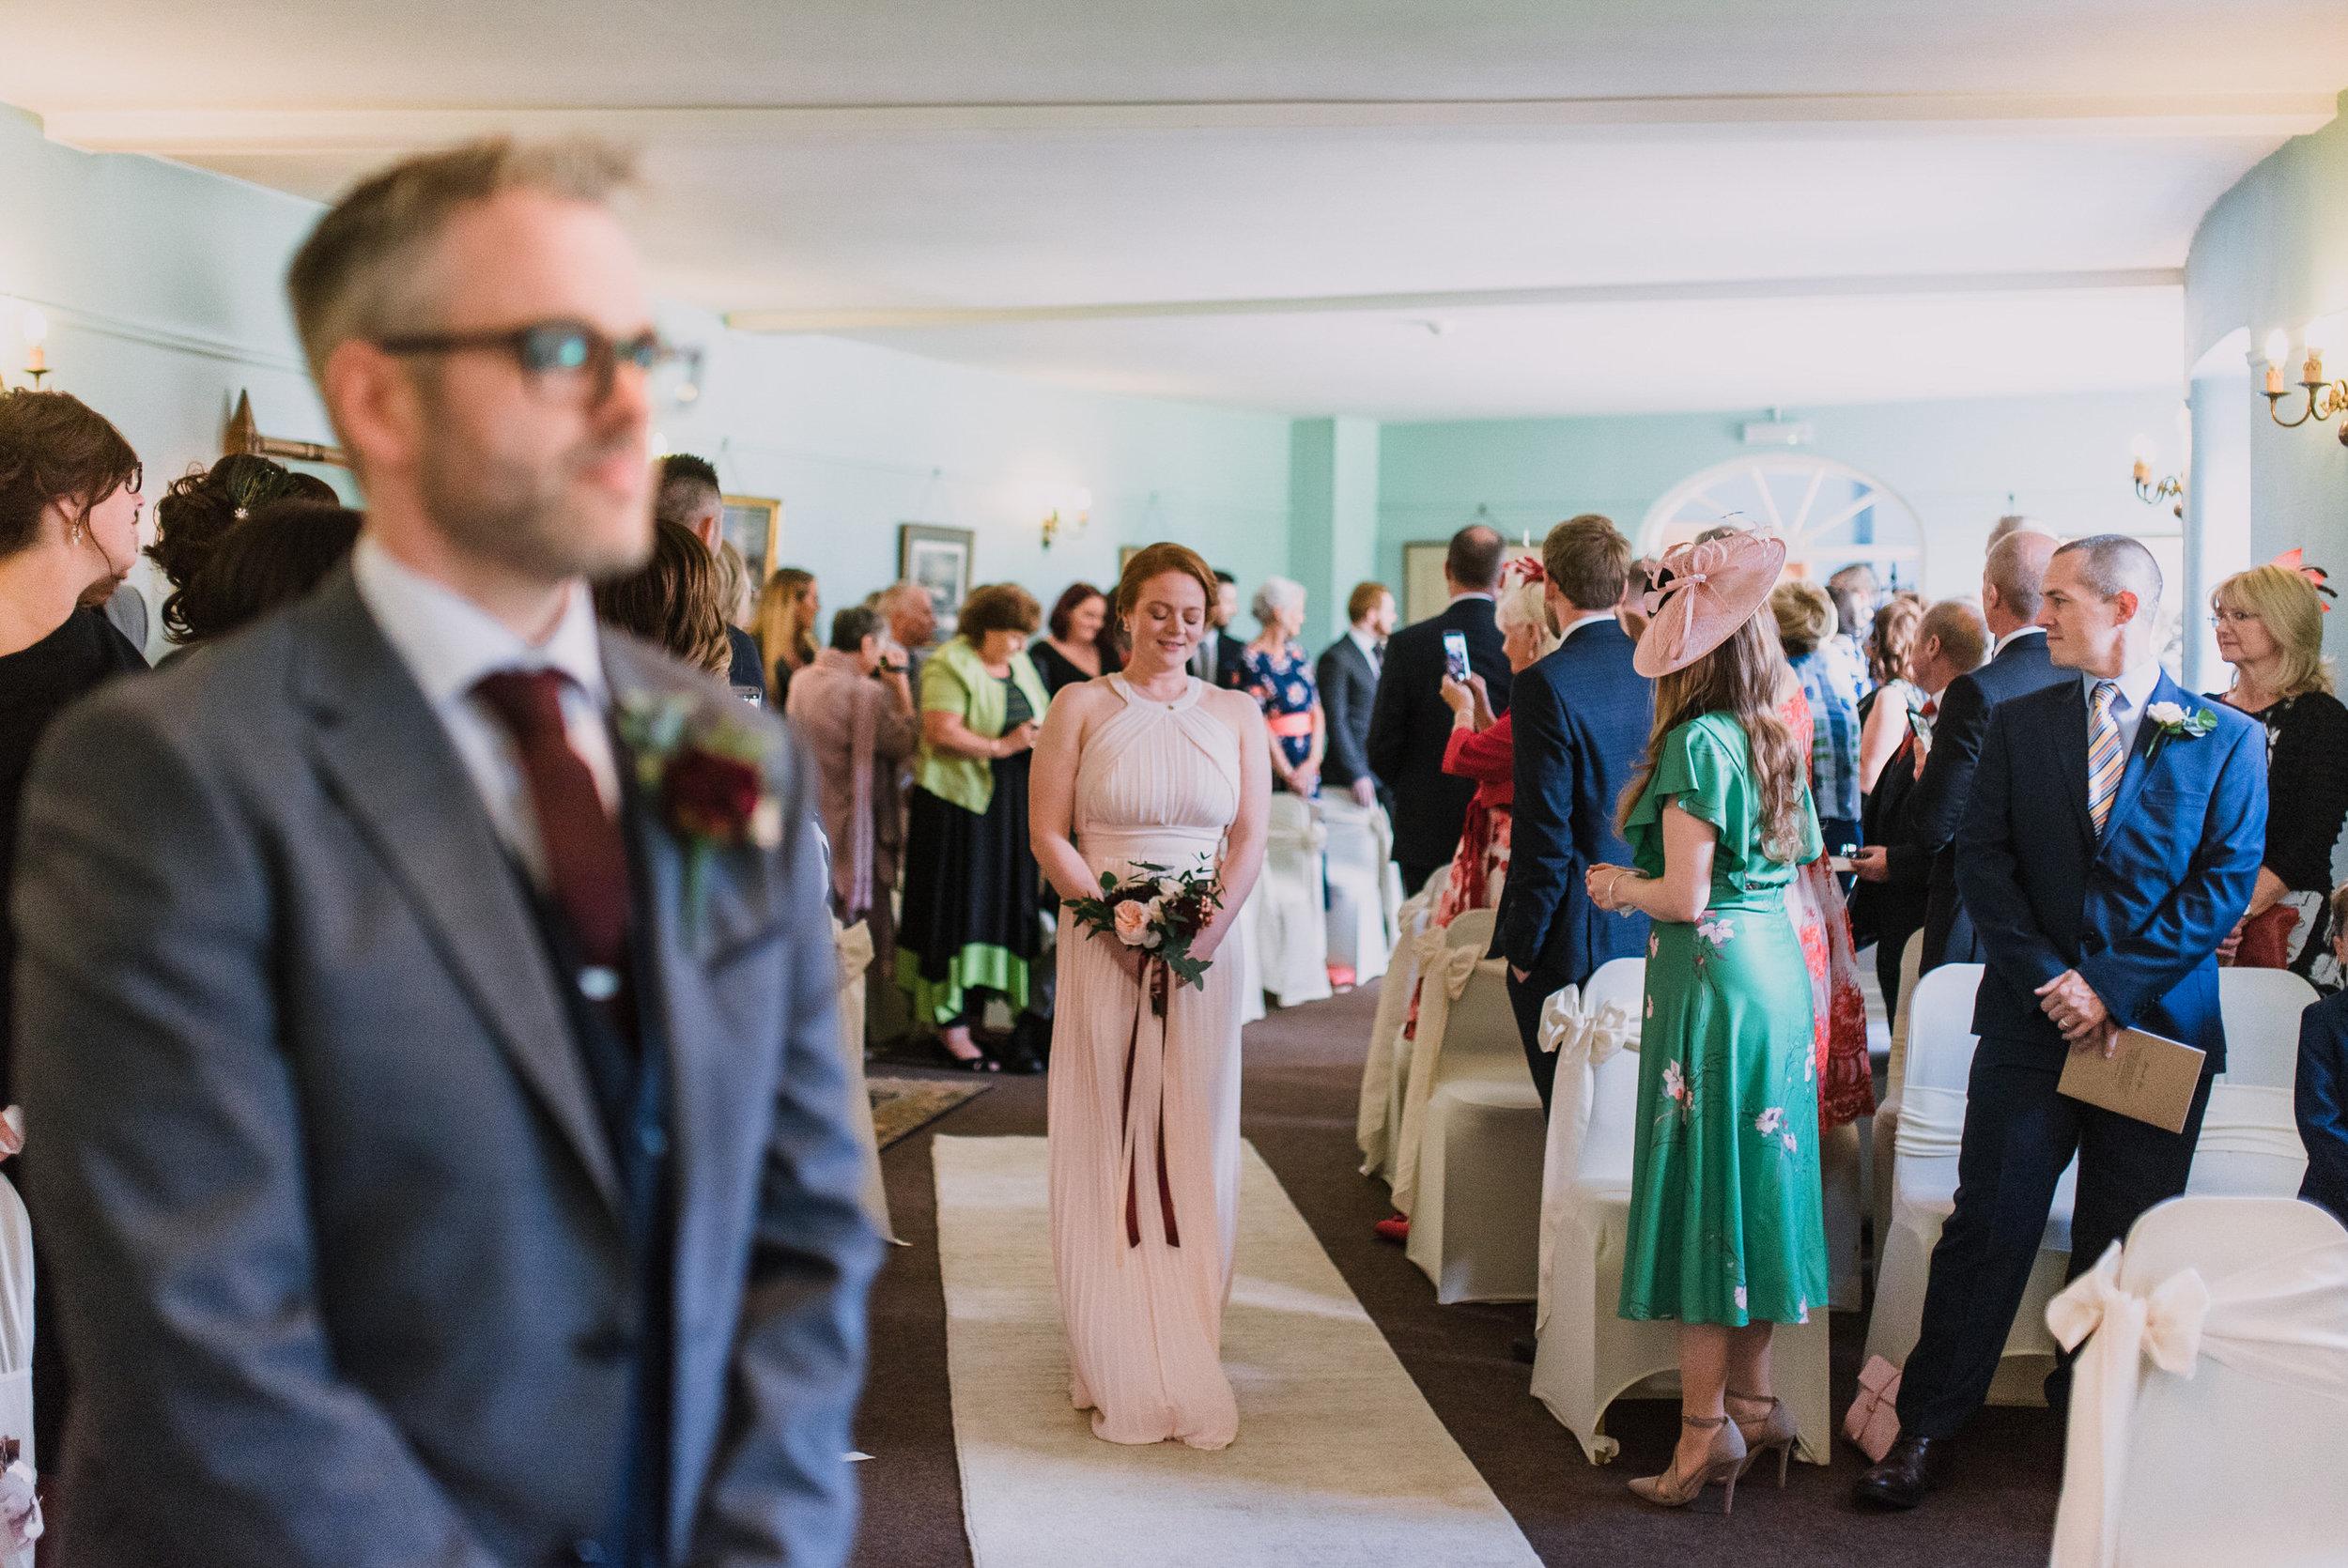 lissanoure castle wedding, northern ireland wedding photographer, romantic northern irish wedding venue, castle wedding ireland, natural wedding photography ni (45).jpg